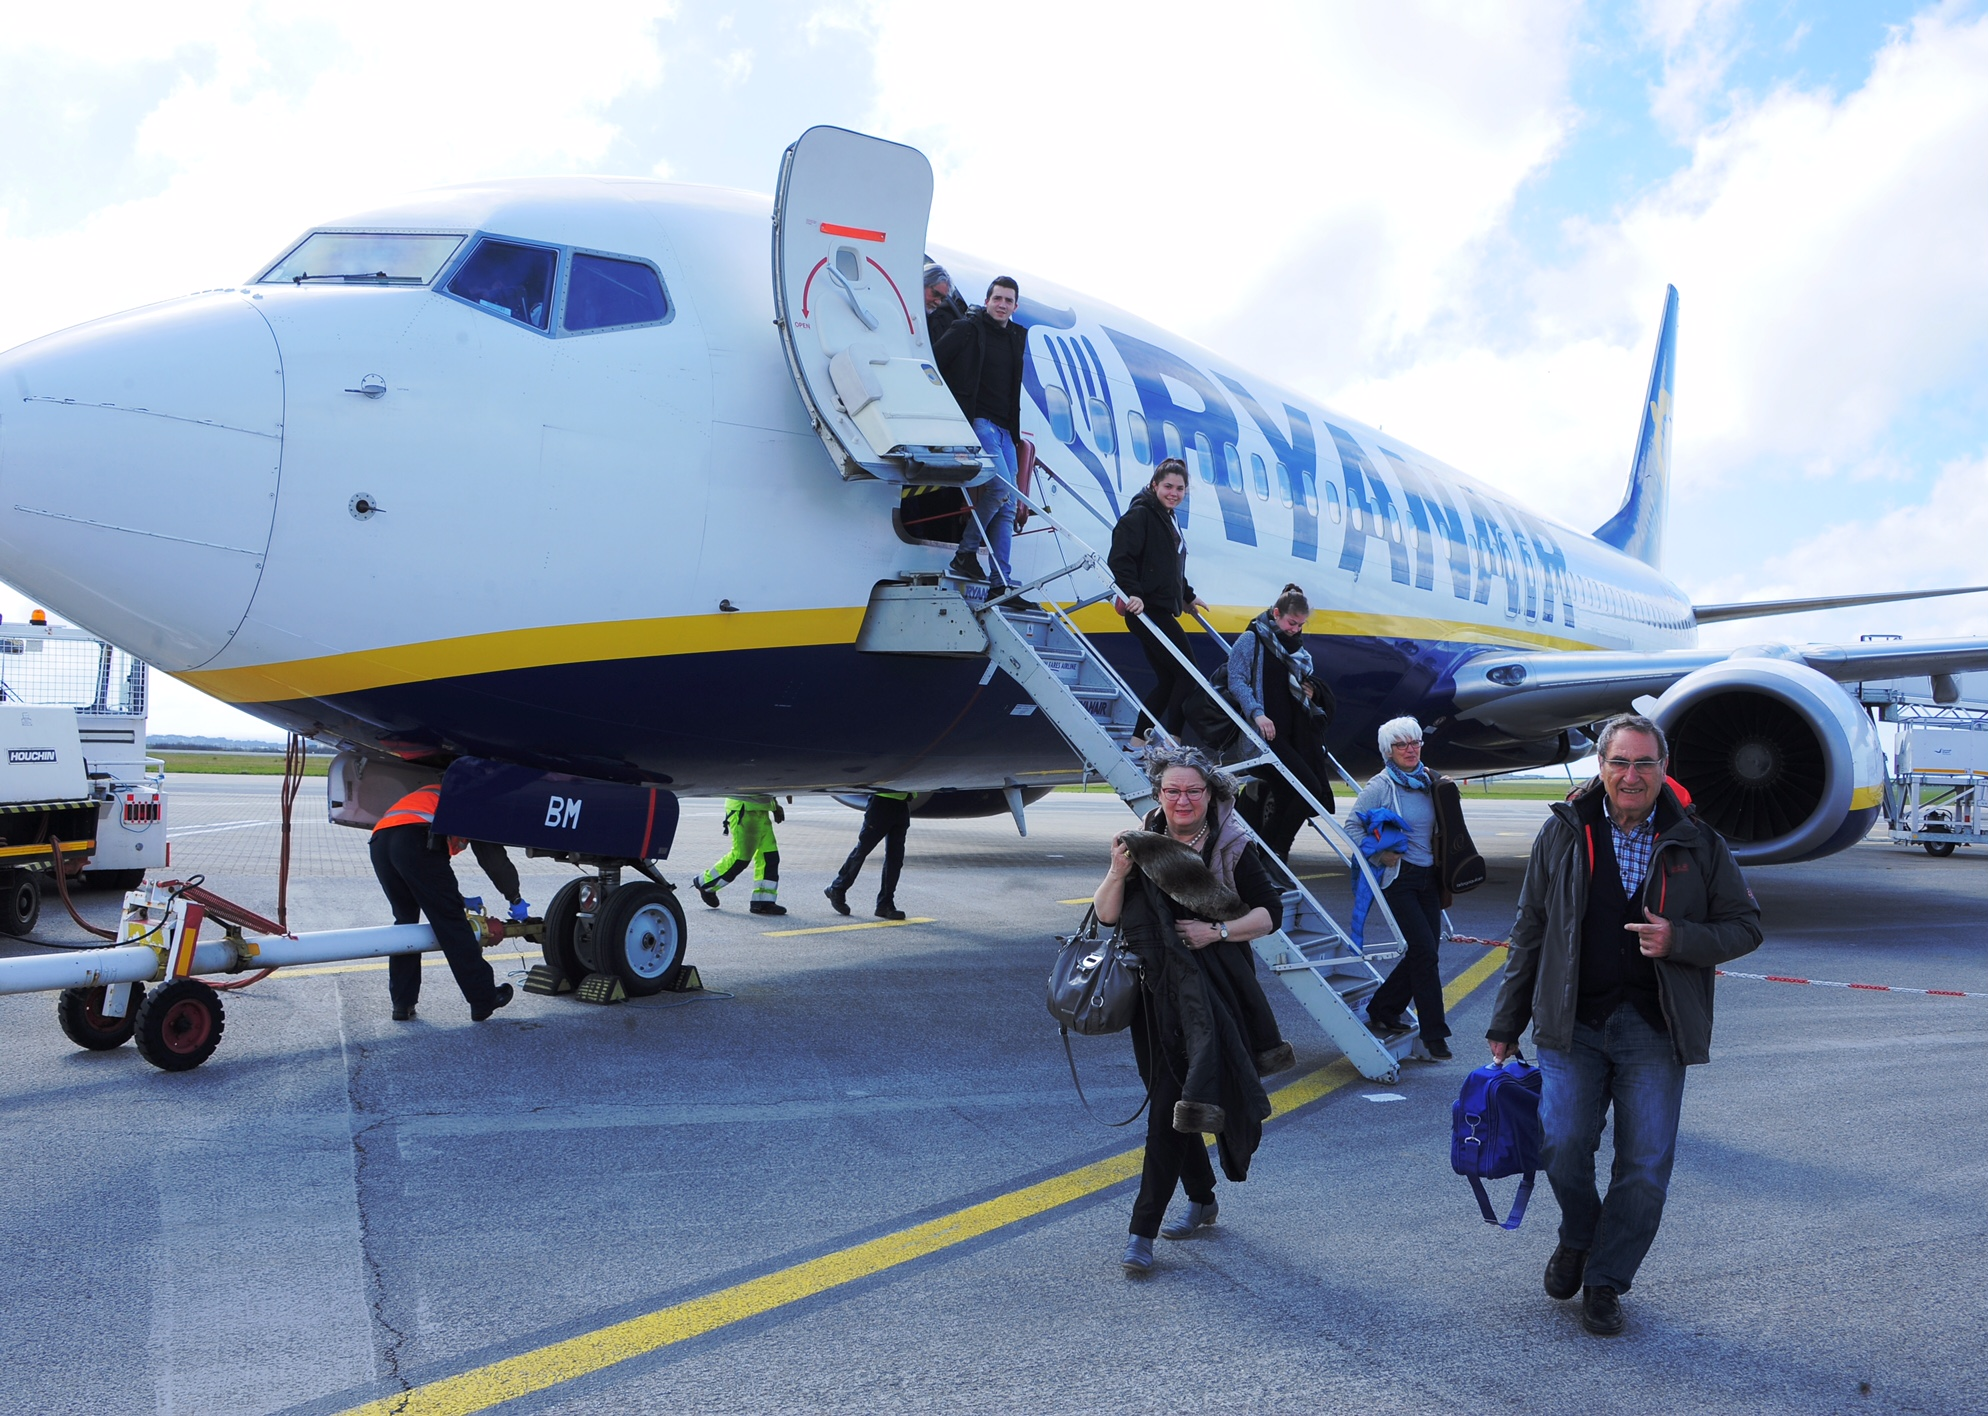 The first passengers disembark the Ryanair flight from Frankfurt